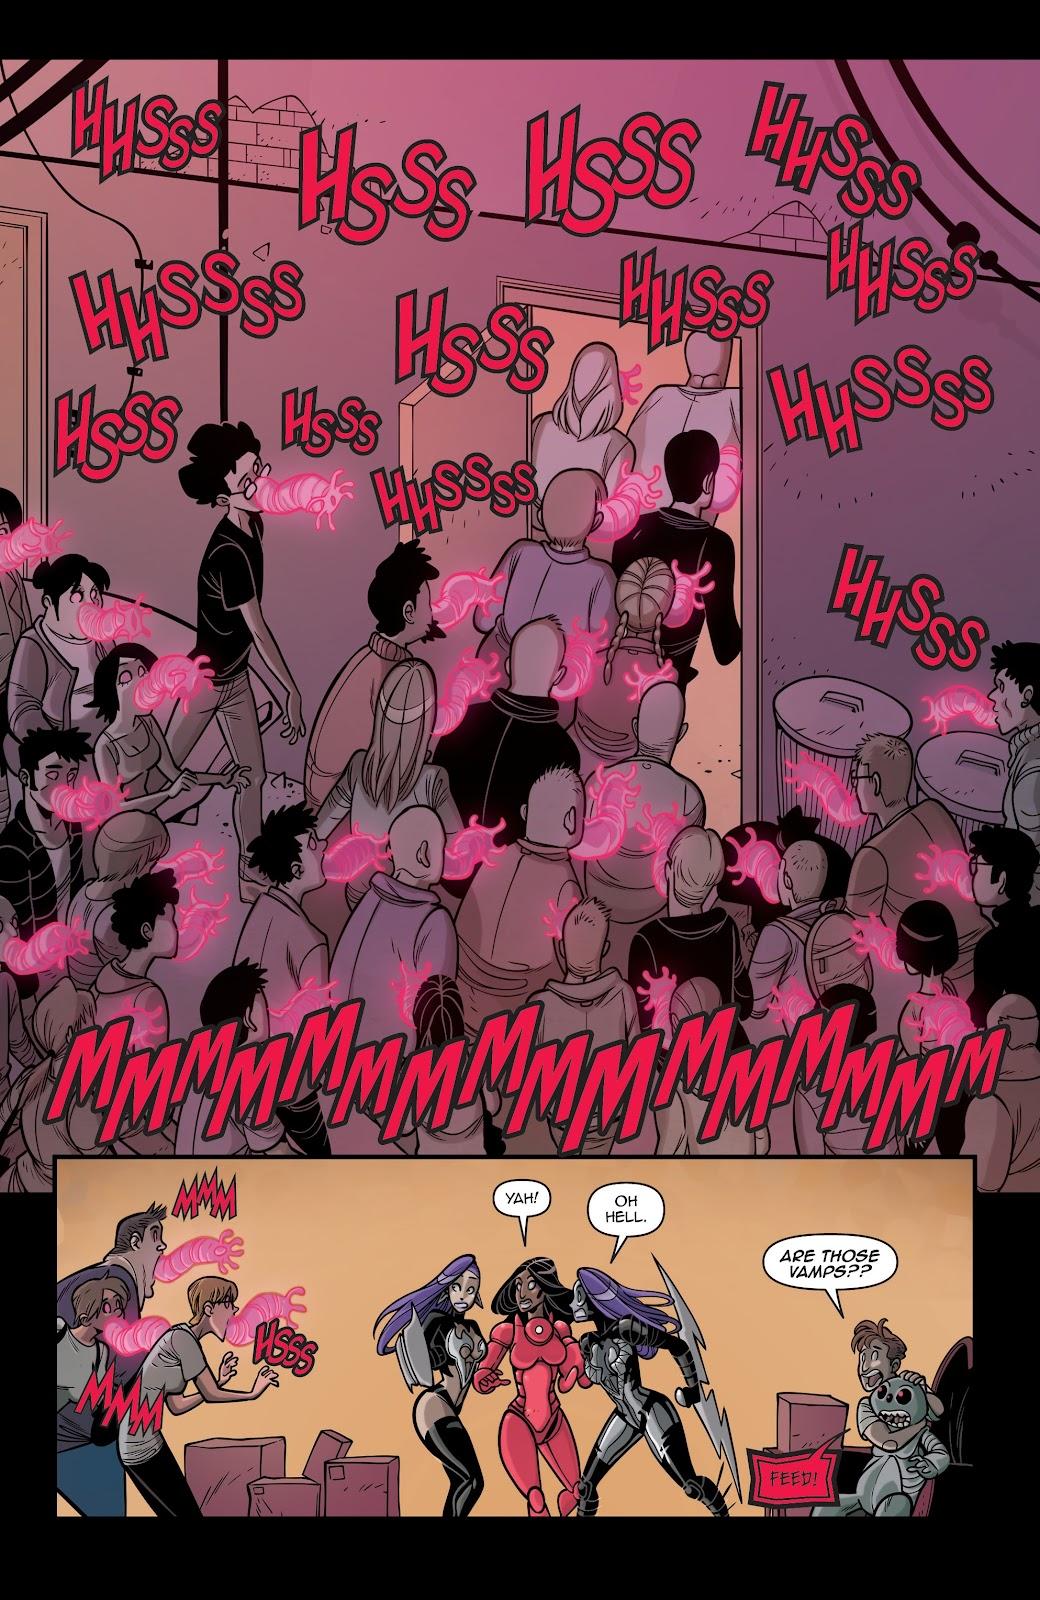 Read online Vampblade Season 3 comic -  Issue #12 - 8